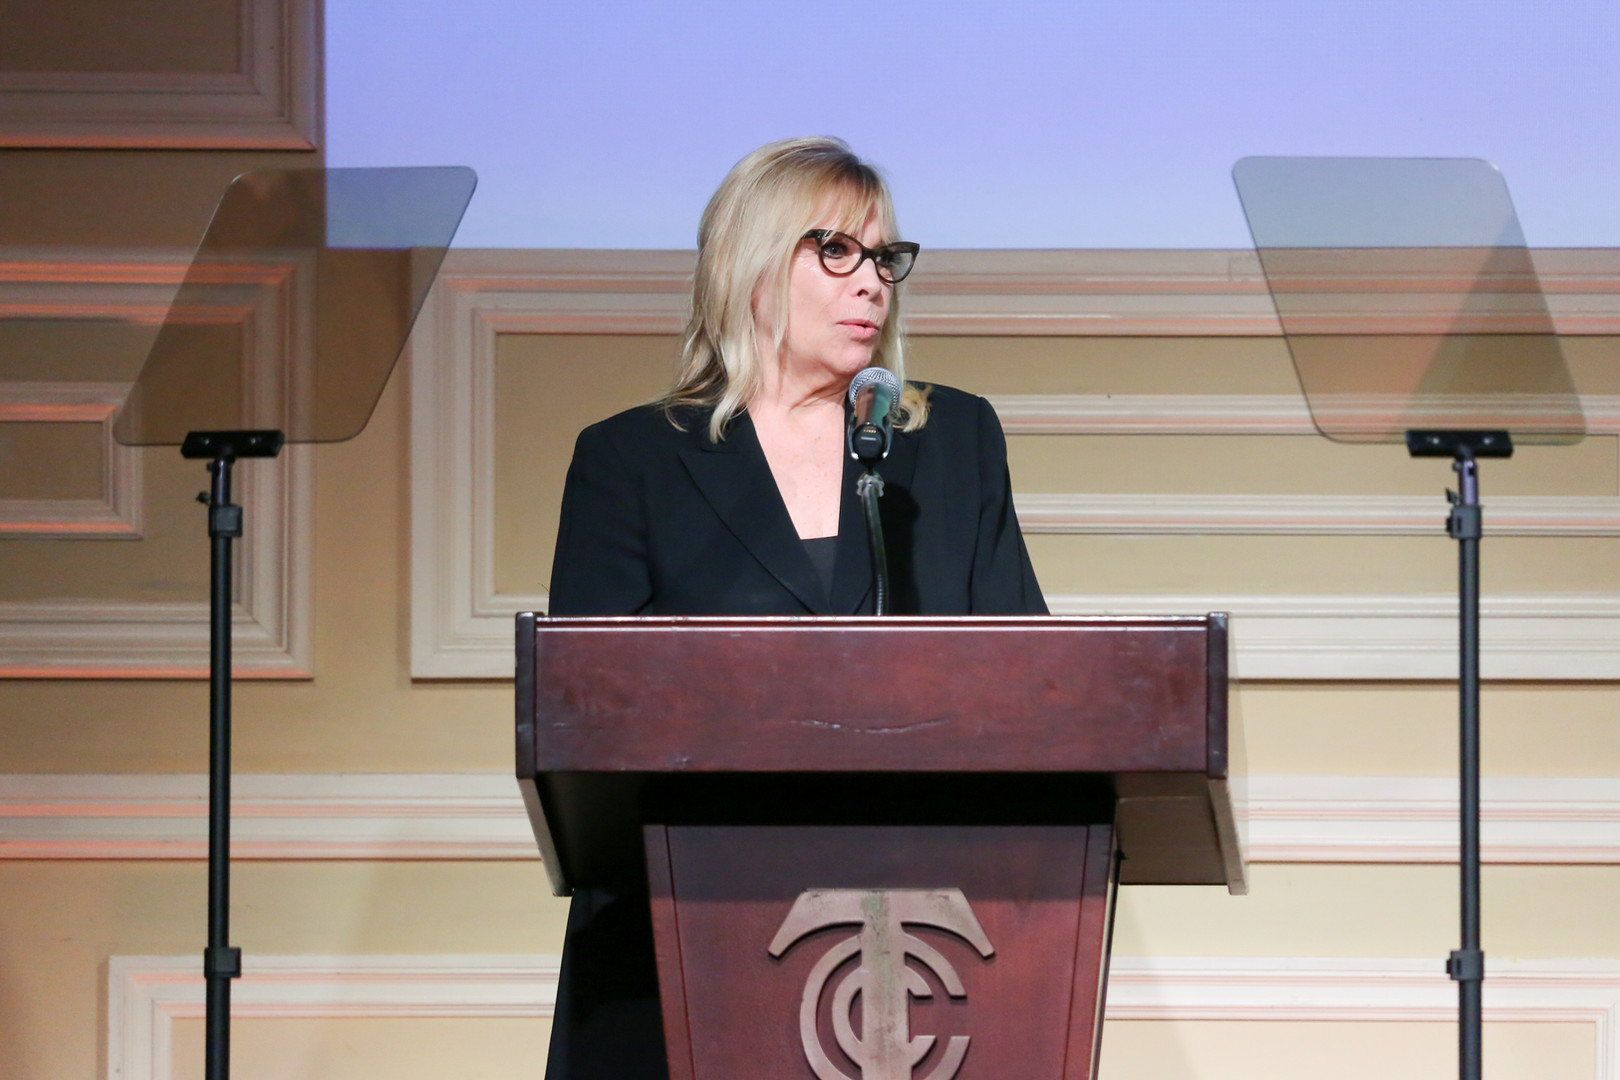 Ellyn Needham presenting the 2019 Lifetime Achievement - Foundation Award